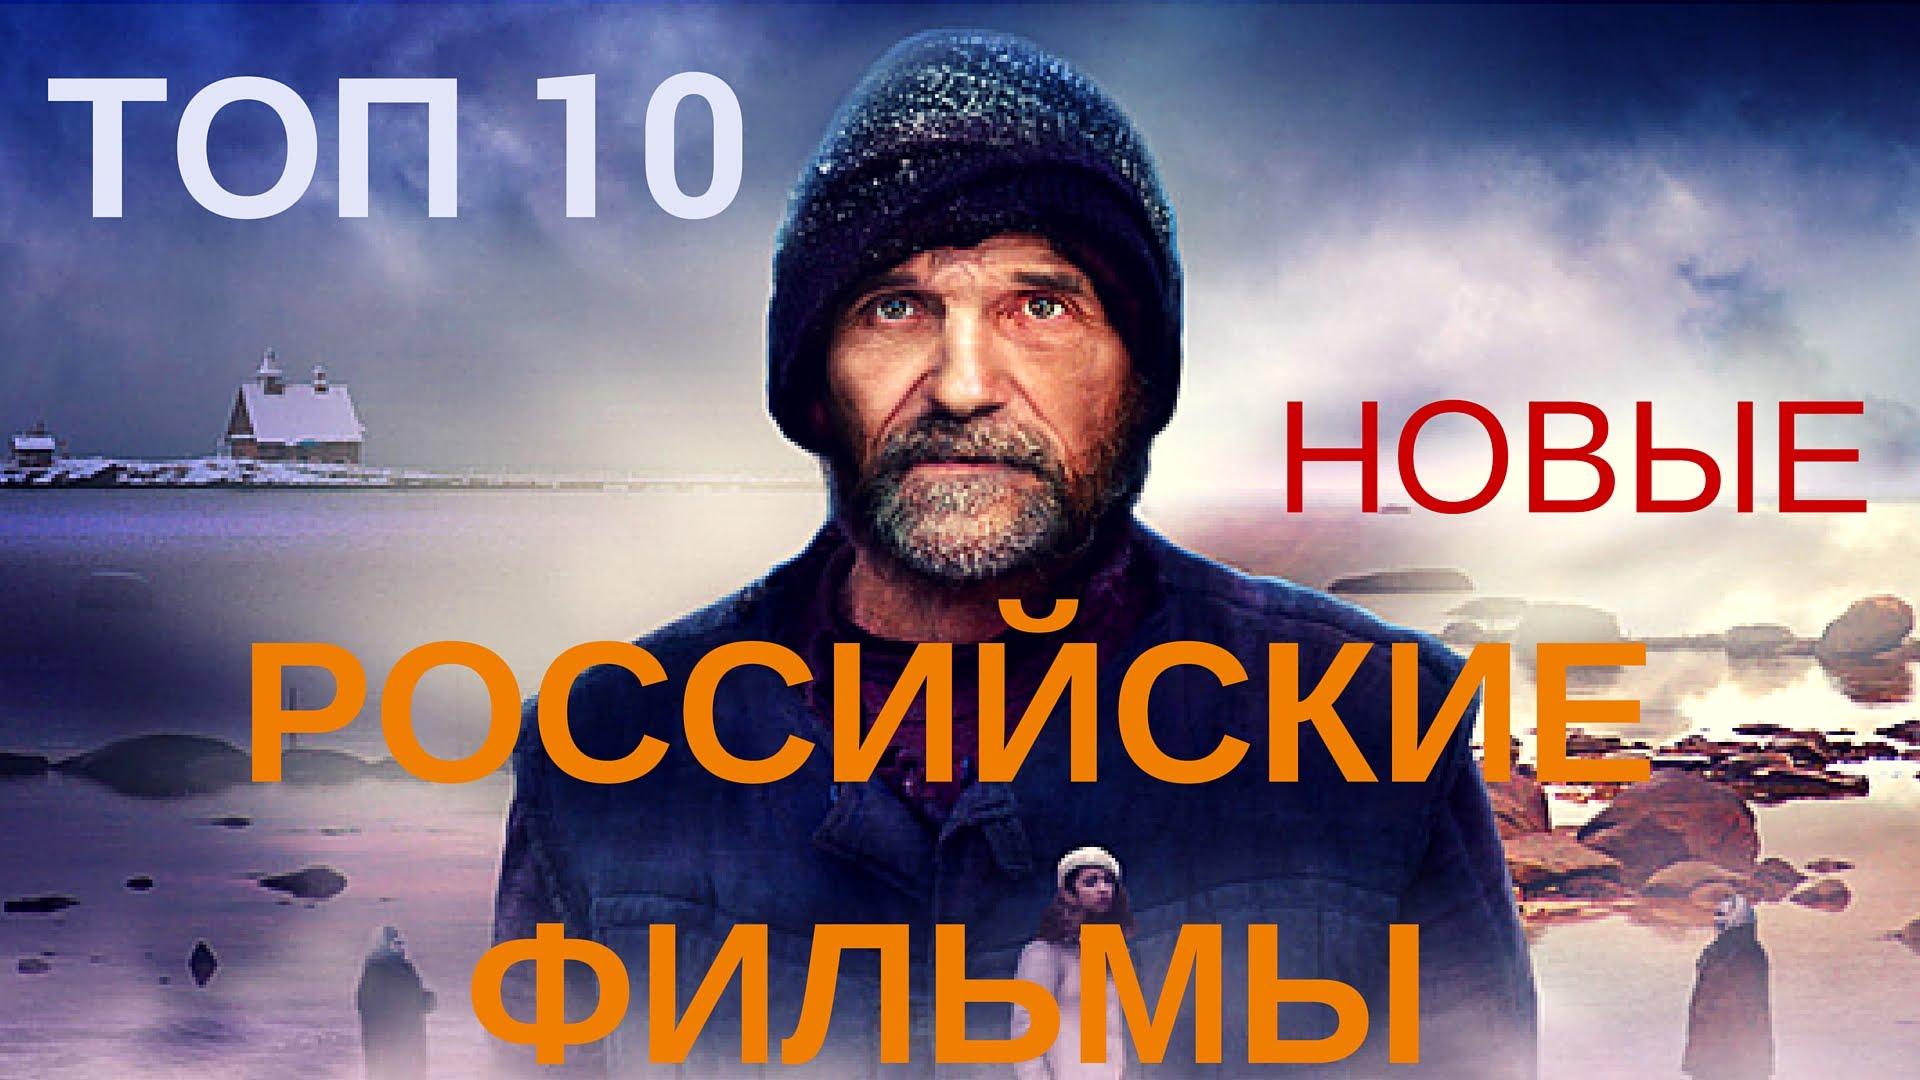 http://www.fast-torrent.ru/russian/